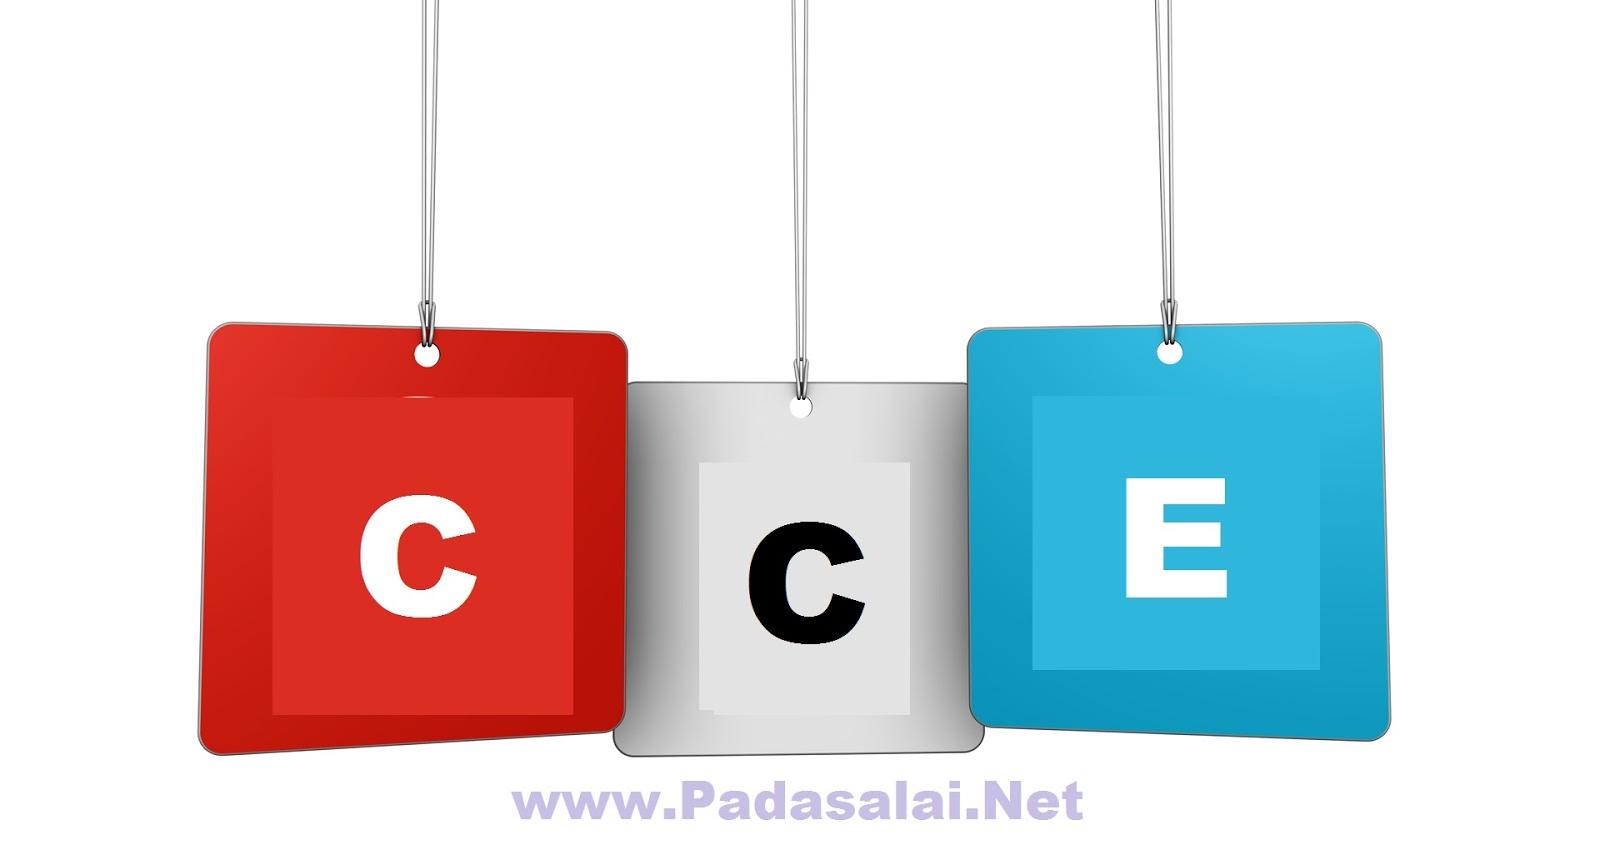 CCE Worksheet 3 Questions Answer Keys – Worksheet Answer Keys